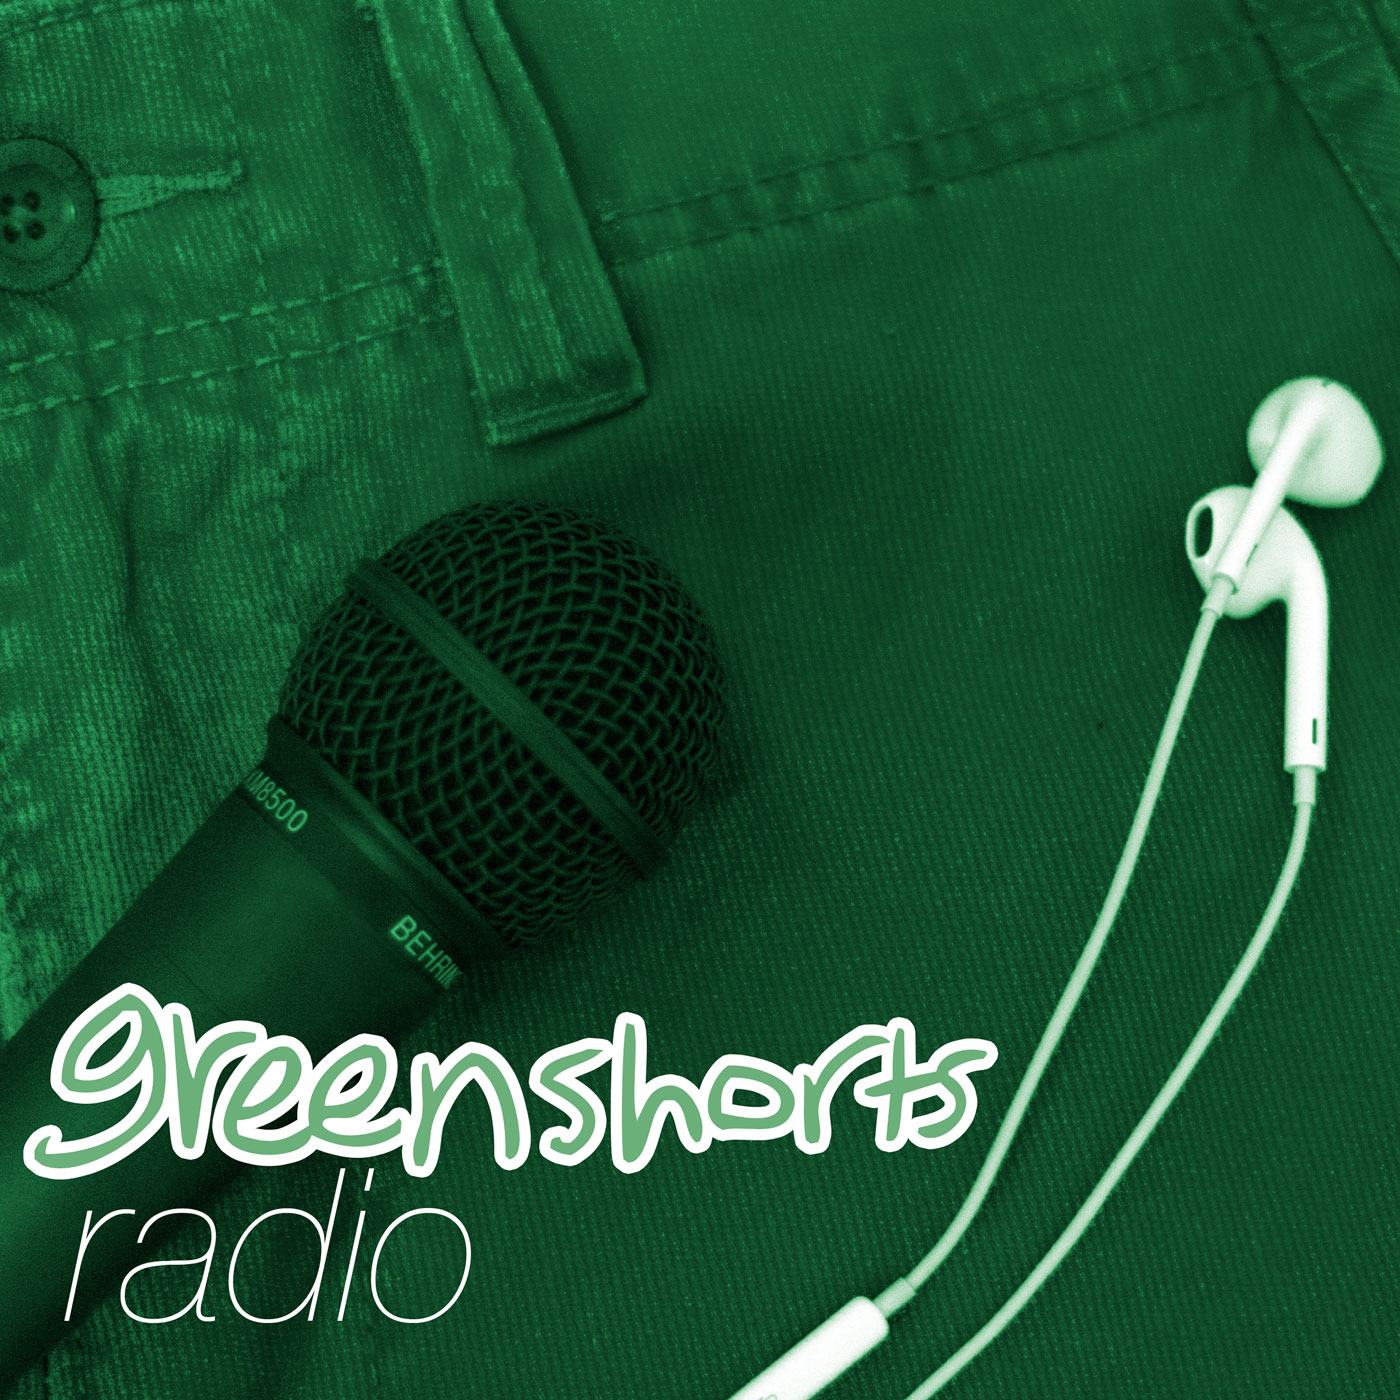 Greenshorts Radio